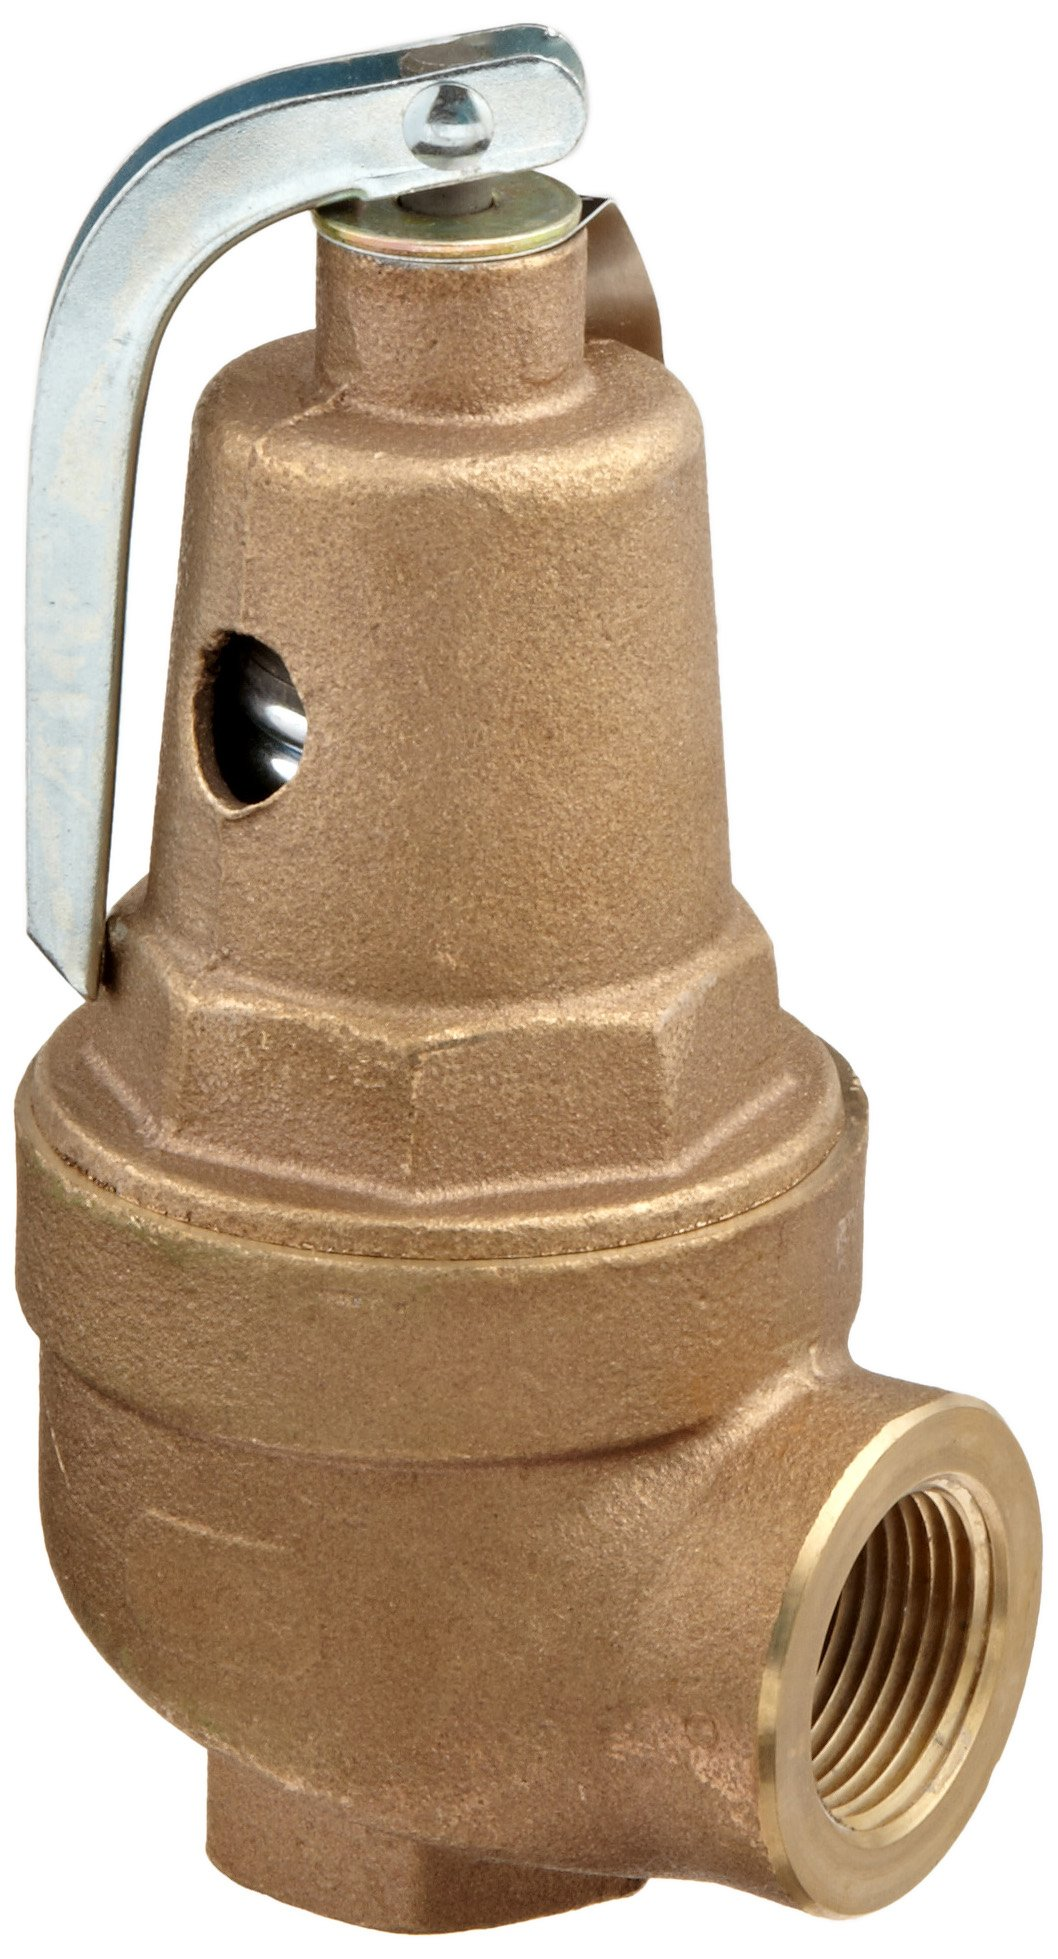 Apollo Valve 10-600 Series Bronze Safety Relief Valve, ASME Hot Water, 125 psi Set Pressure, 1'' NPT Female